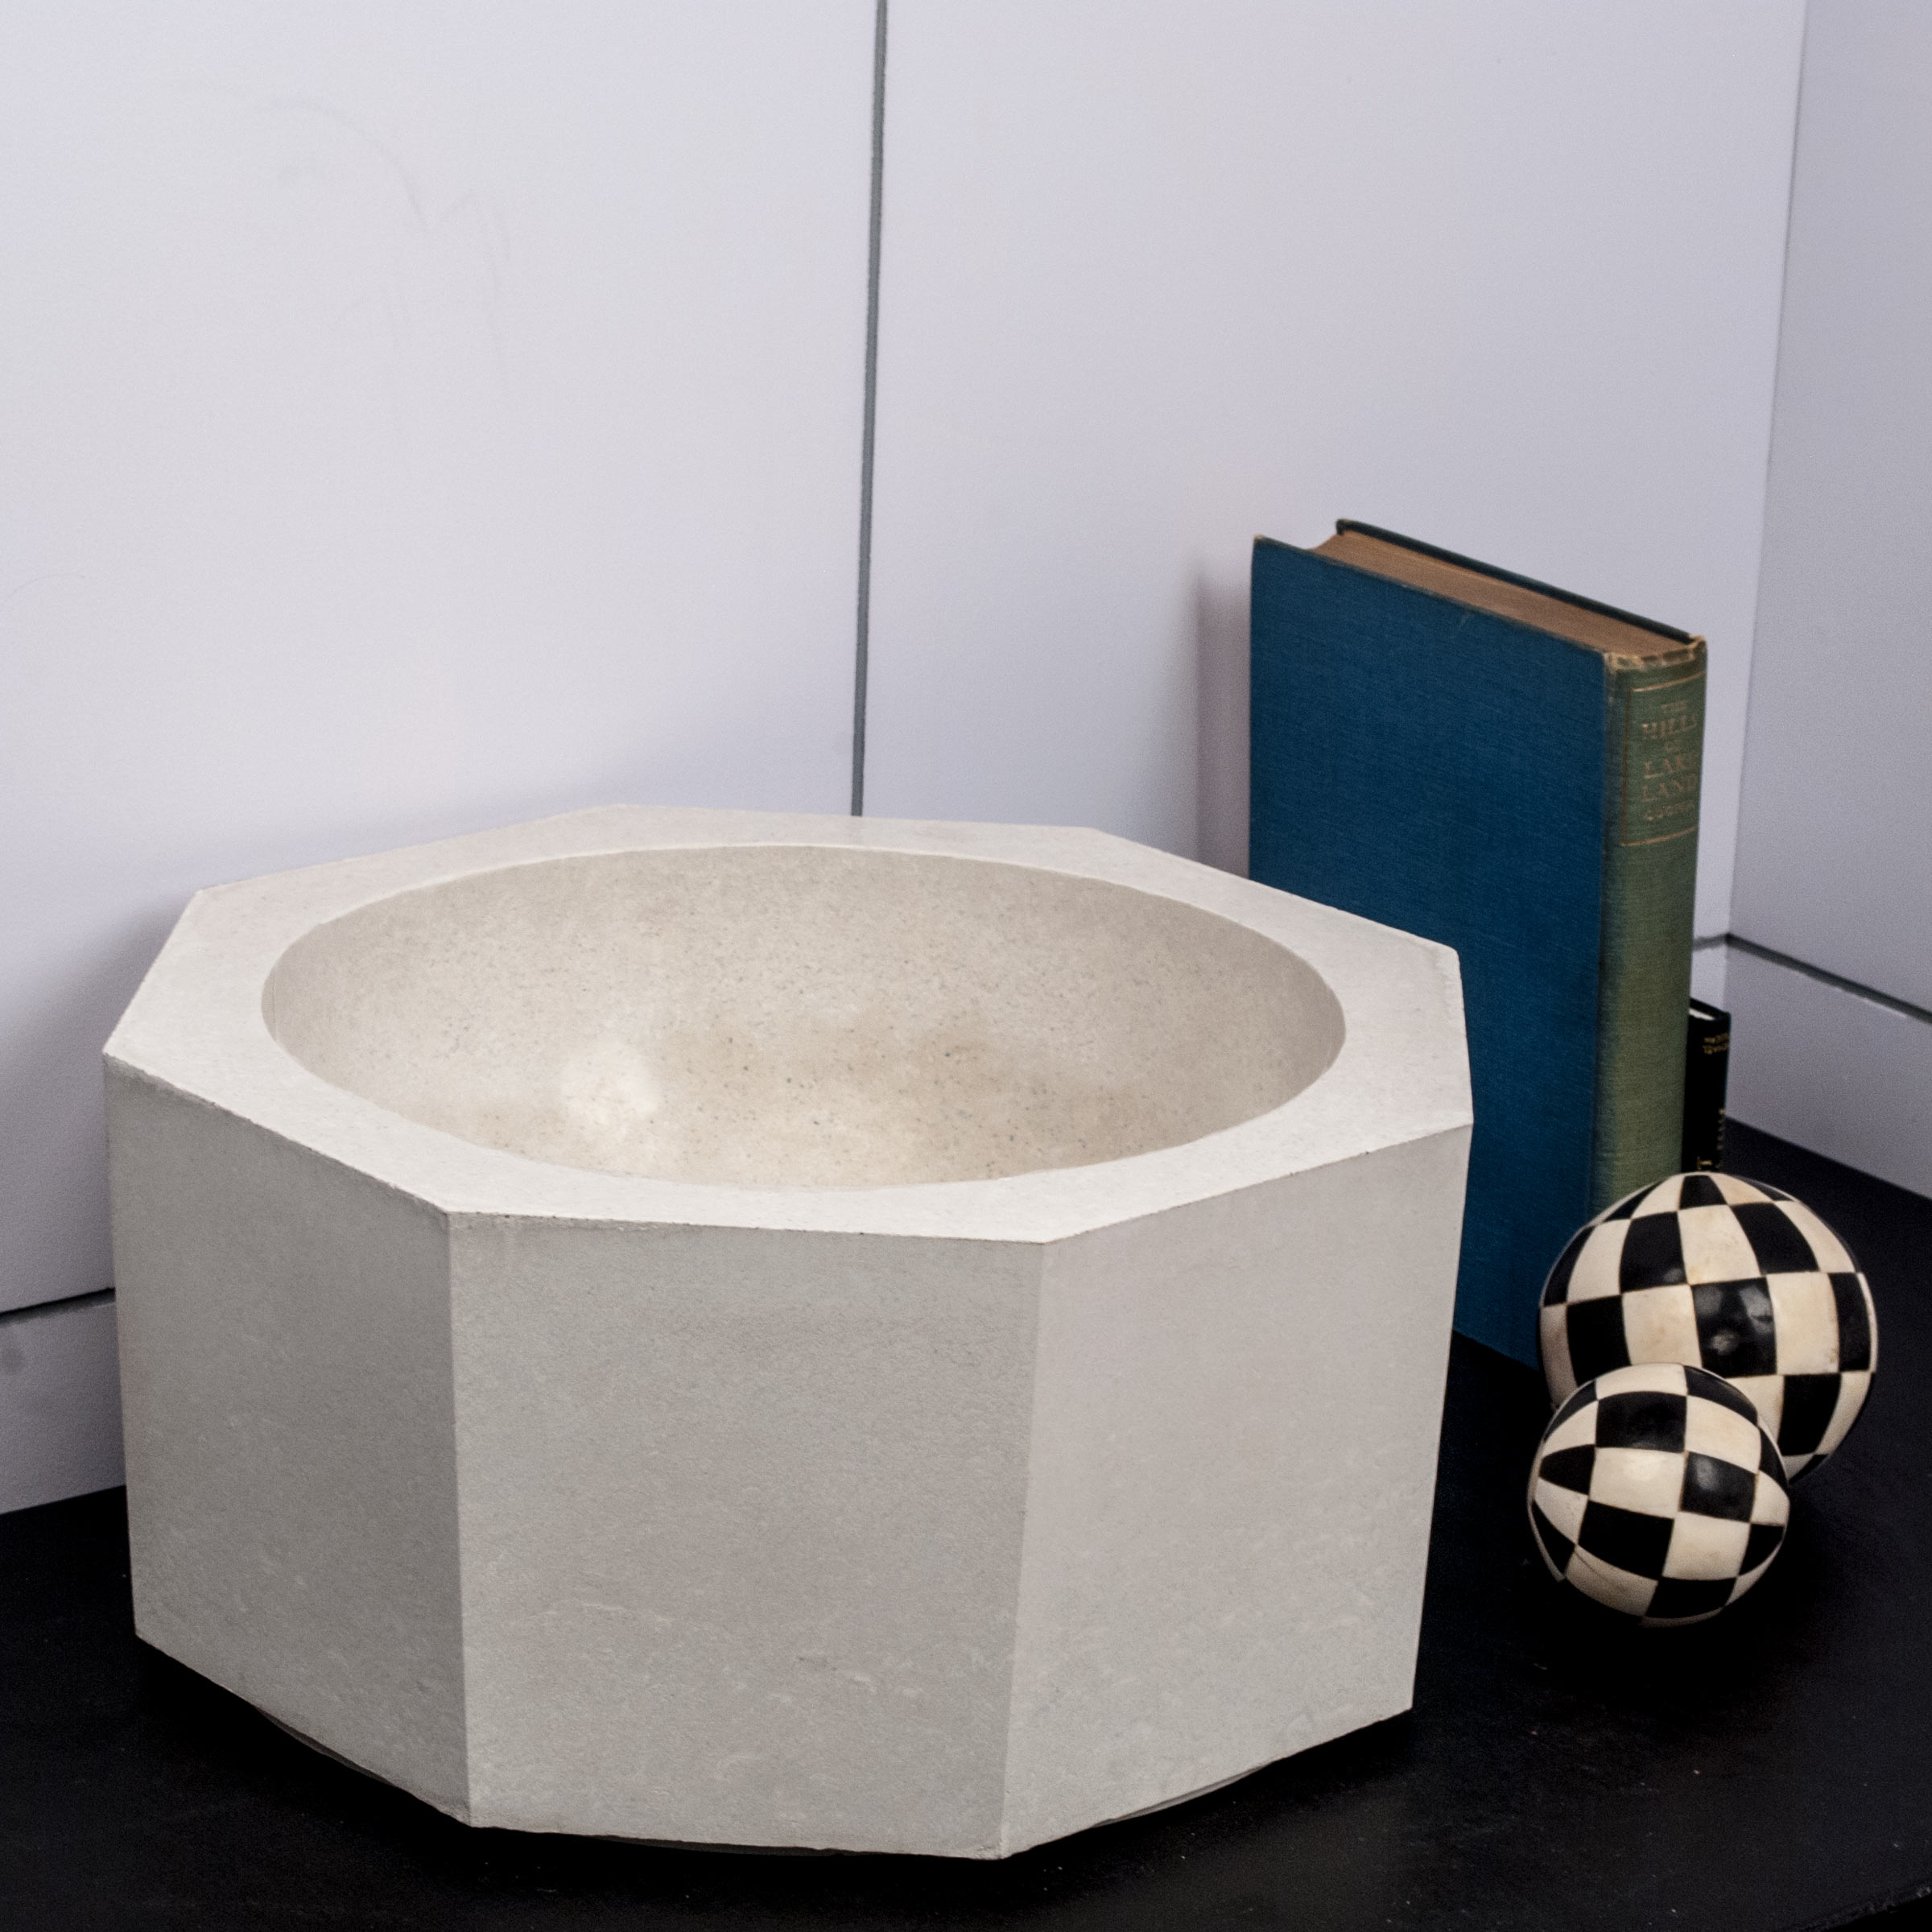 white-bowljpg-comp.jpg